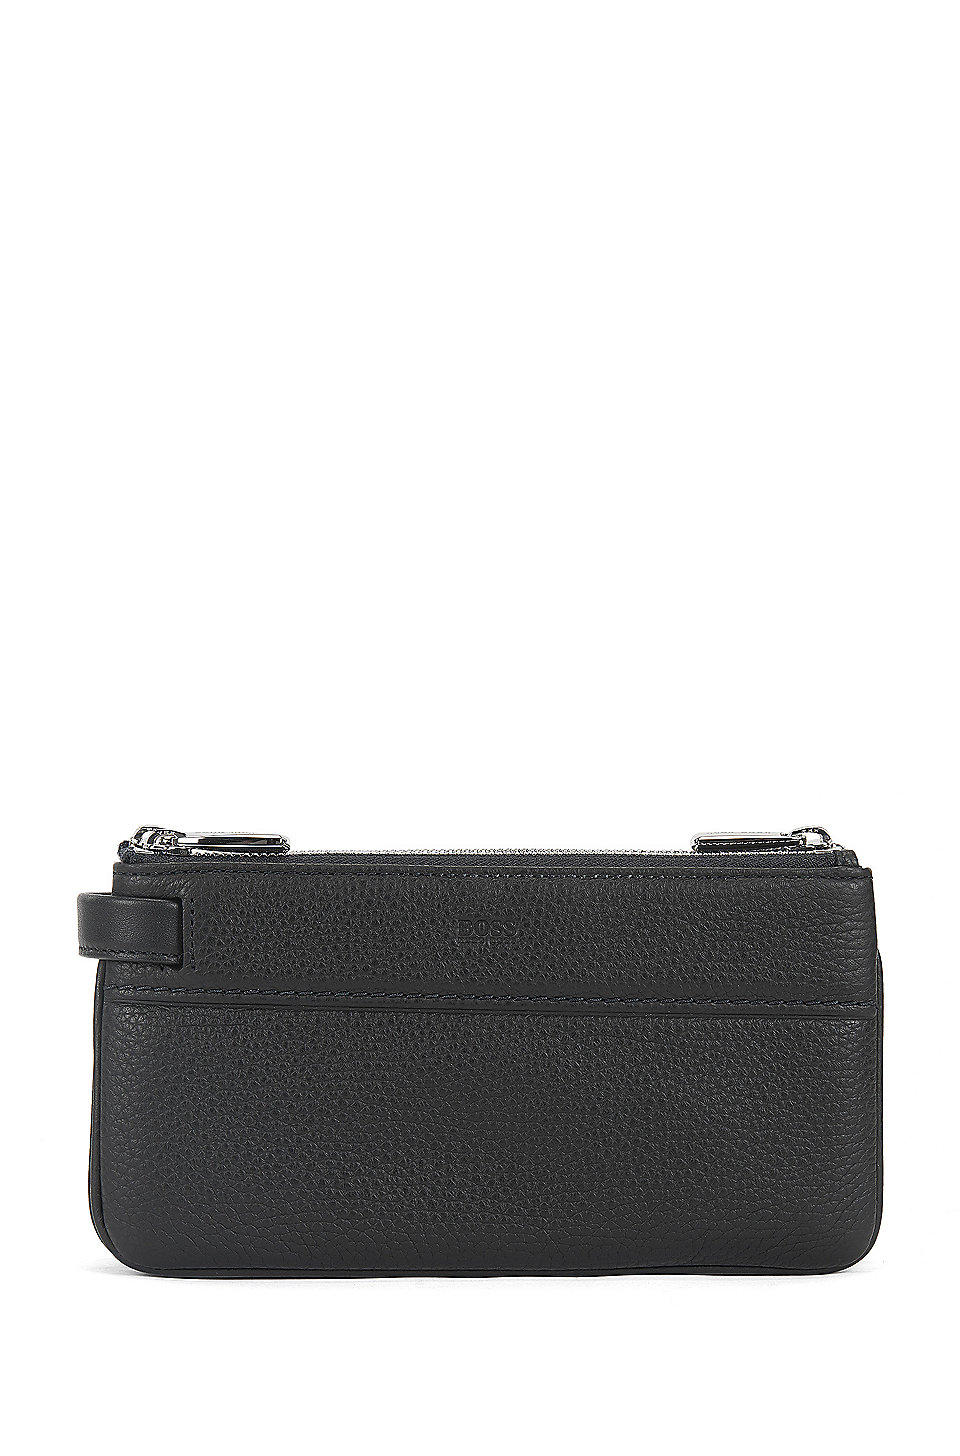 BOSS Hugo Boss 3-Zip Leather Bag Traveller Z One Size Black NQ9jT5CNq